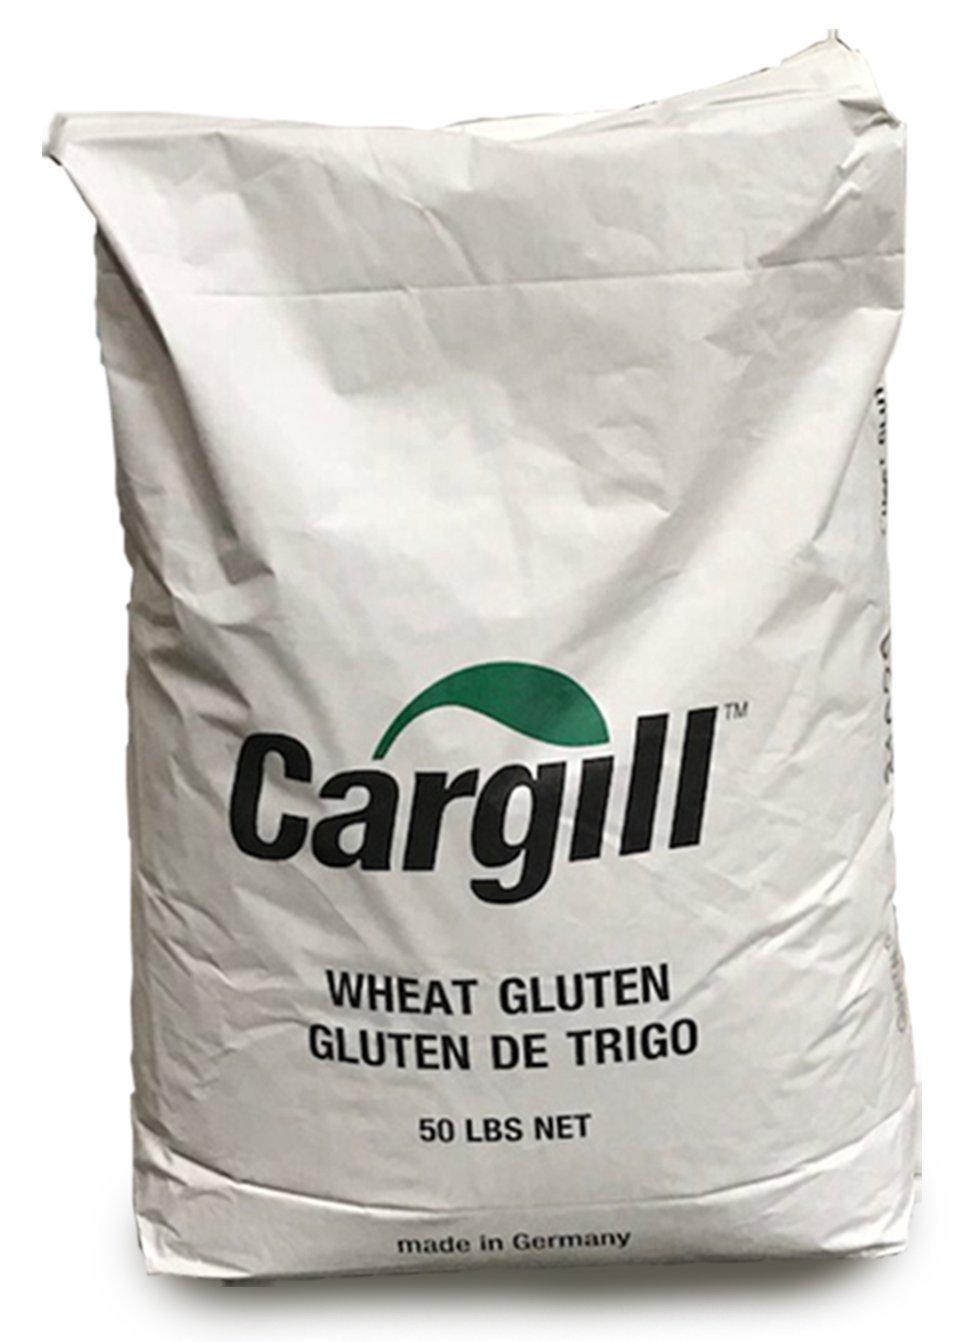 Vital Wheat Gluten - 50 lb. bag by Cargill (Image #1)